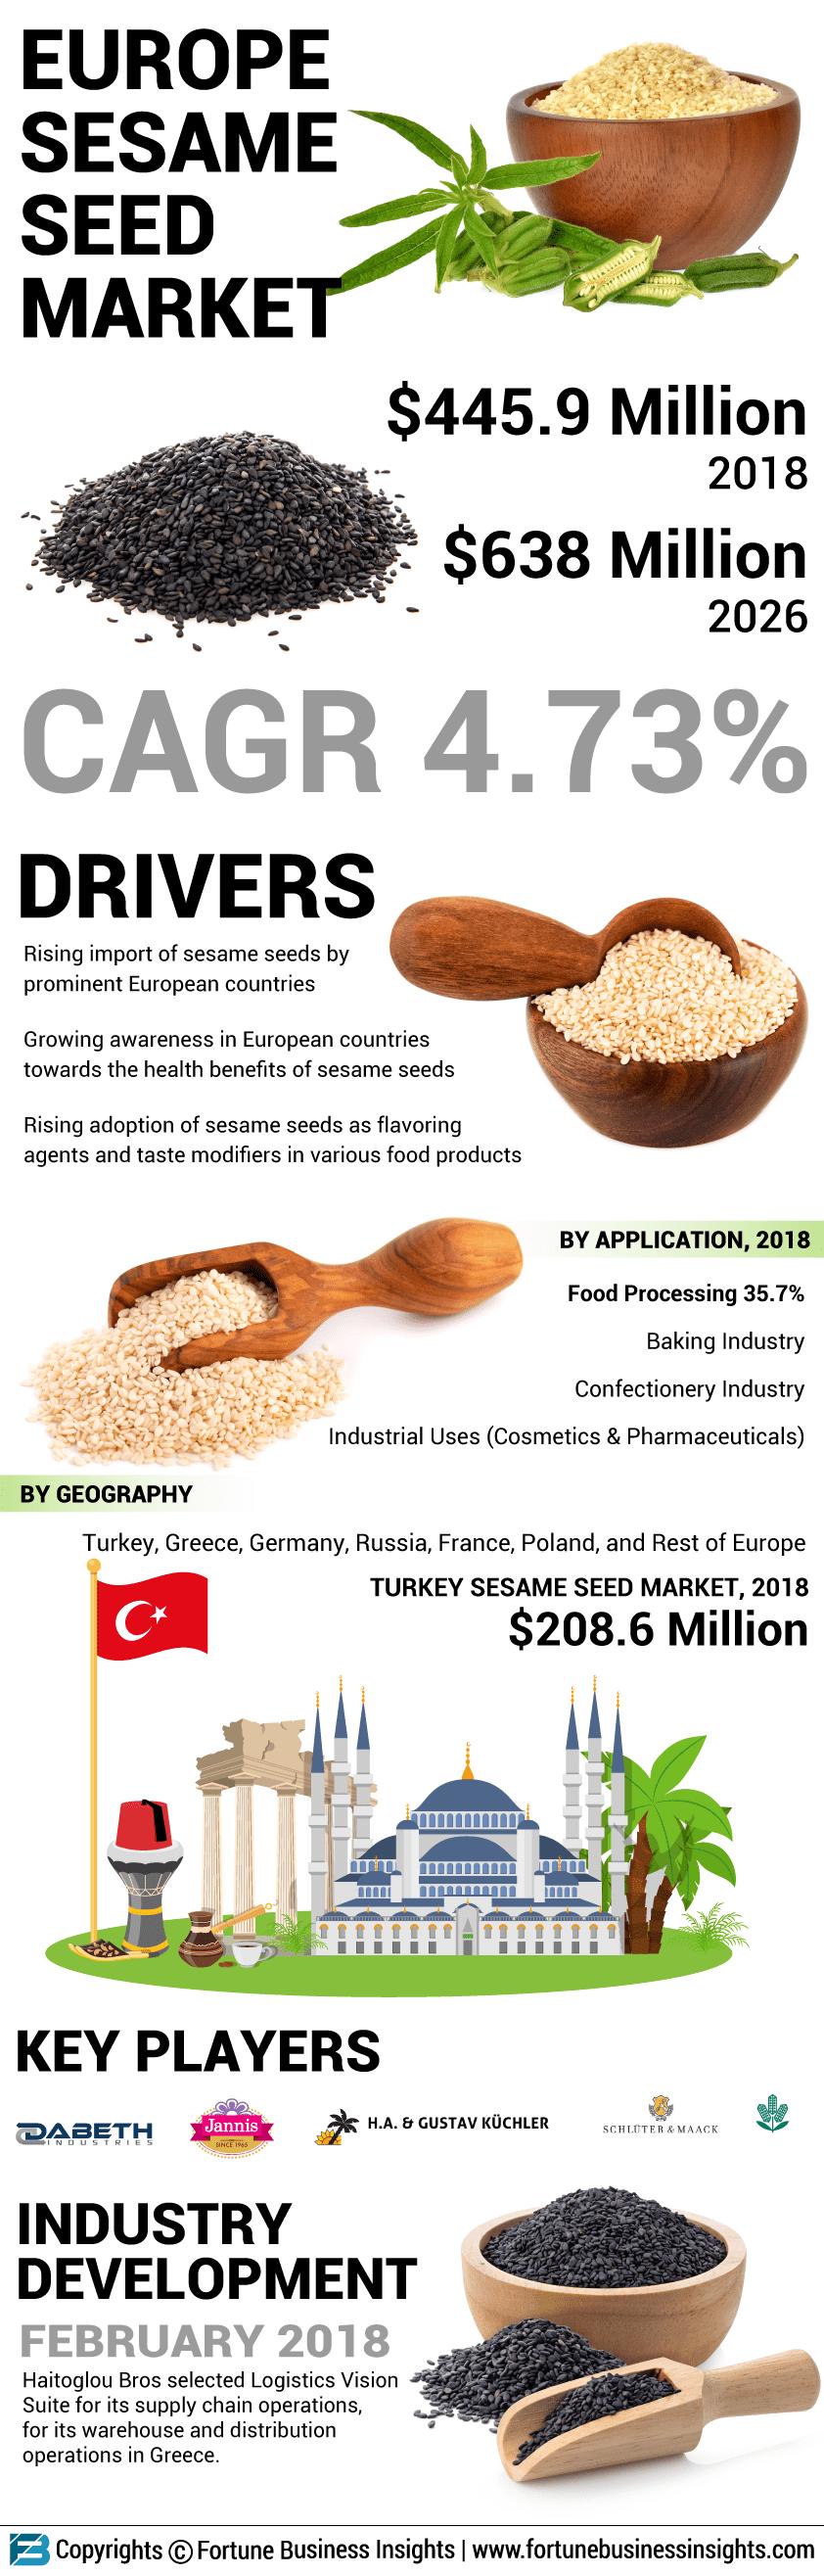 Europe Sesame Seed Market